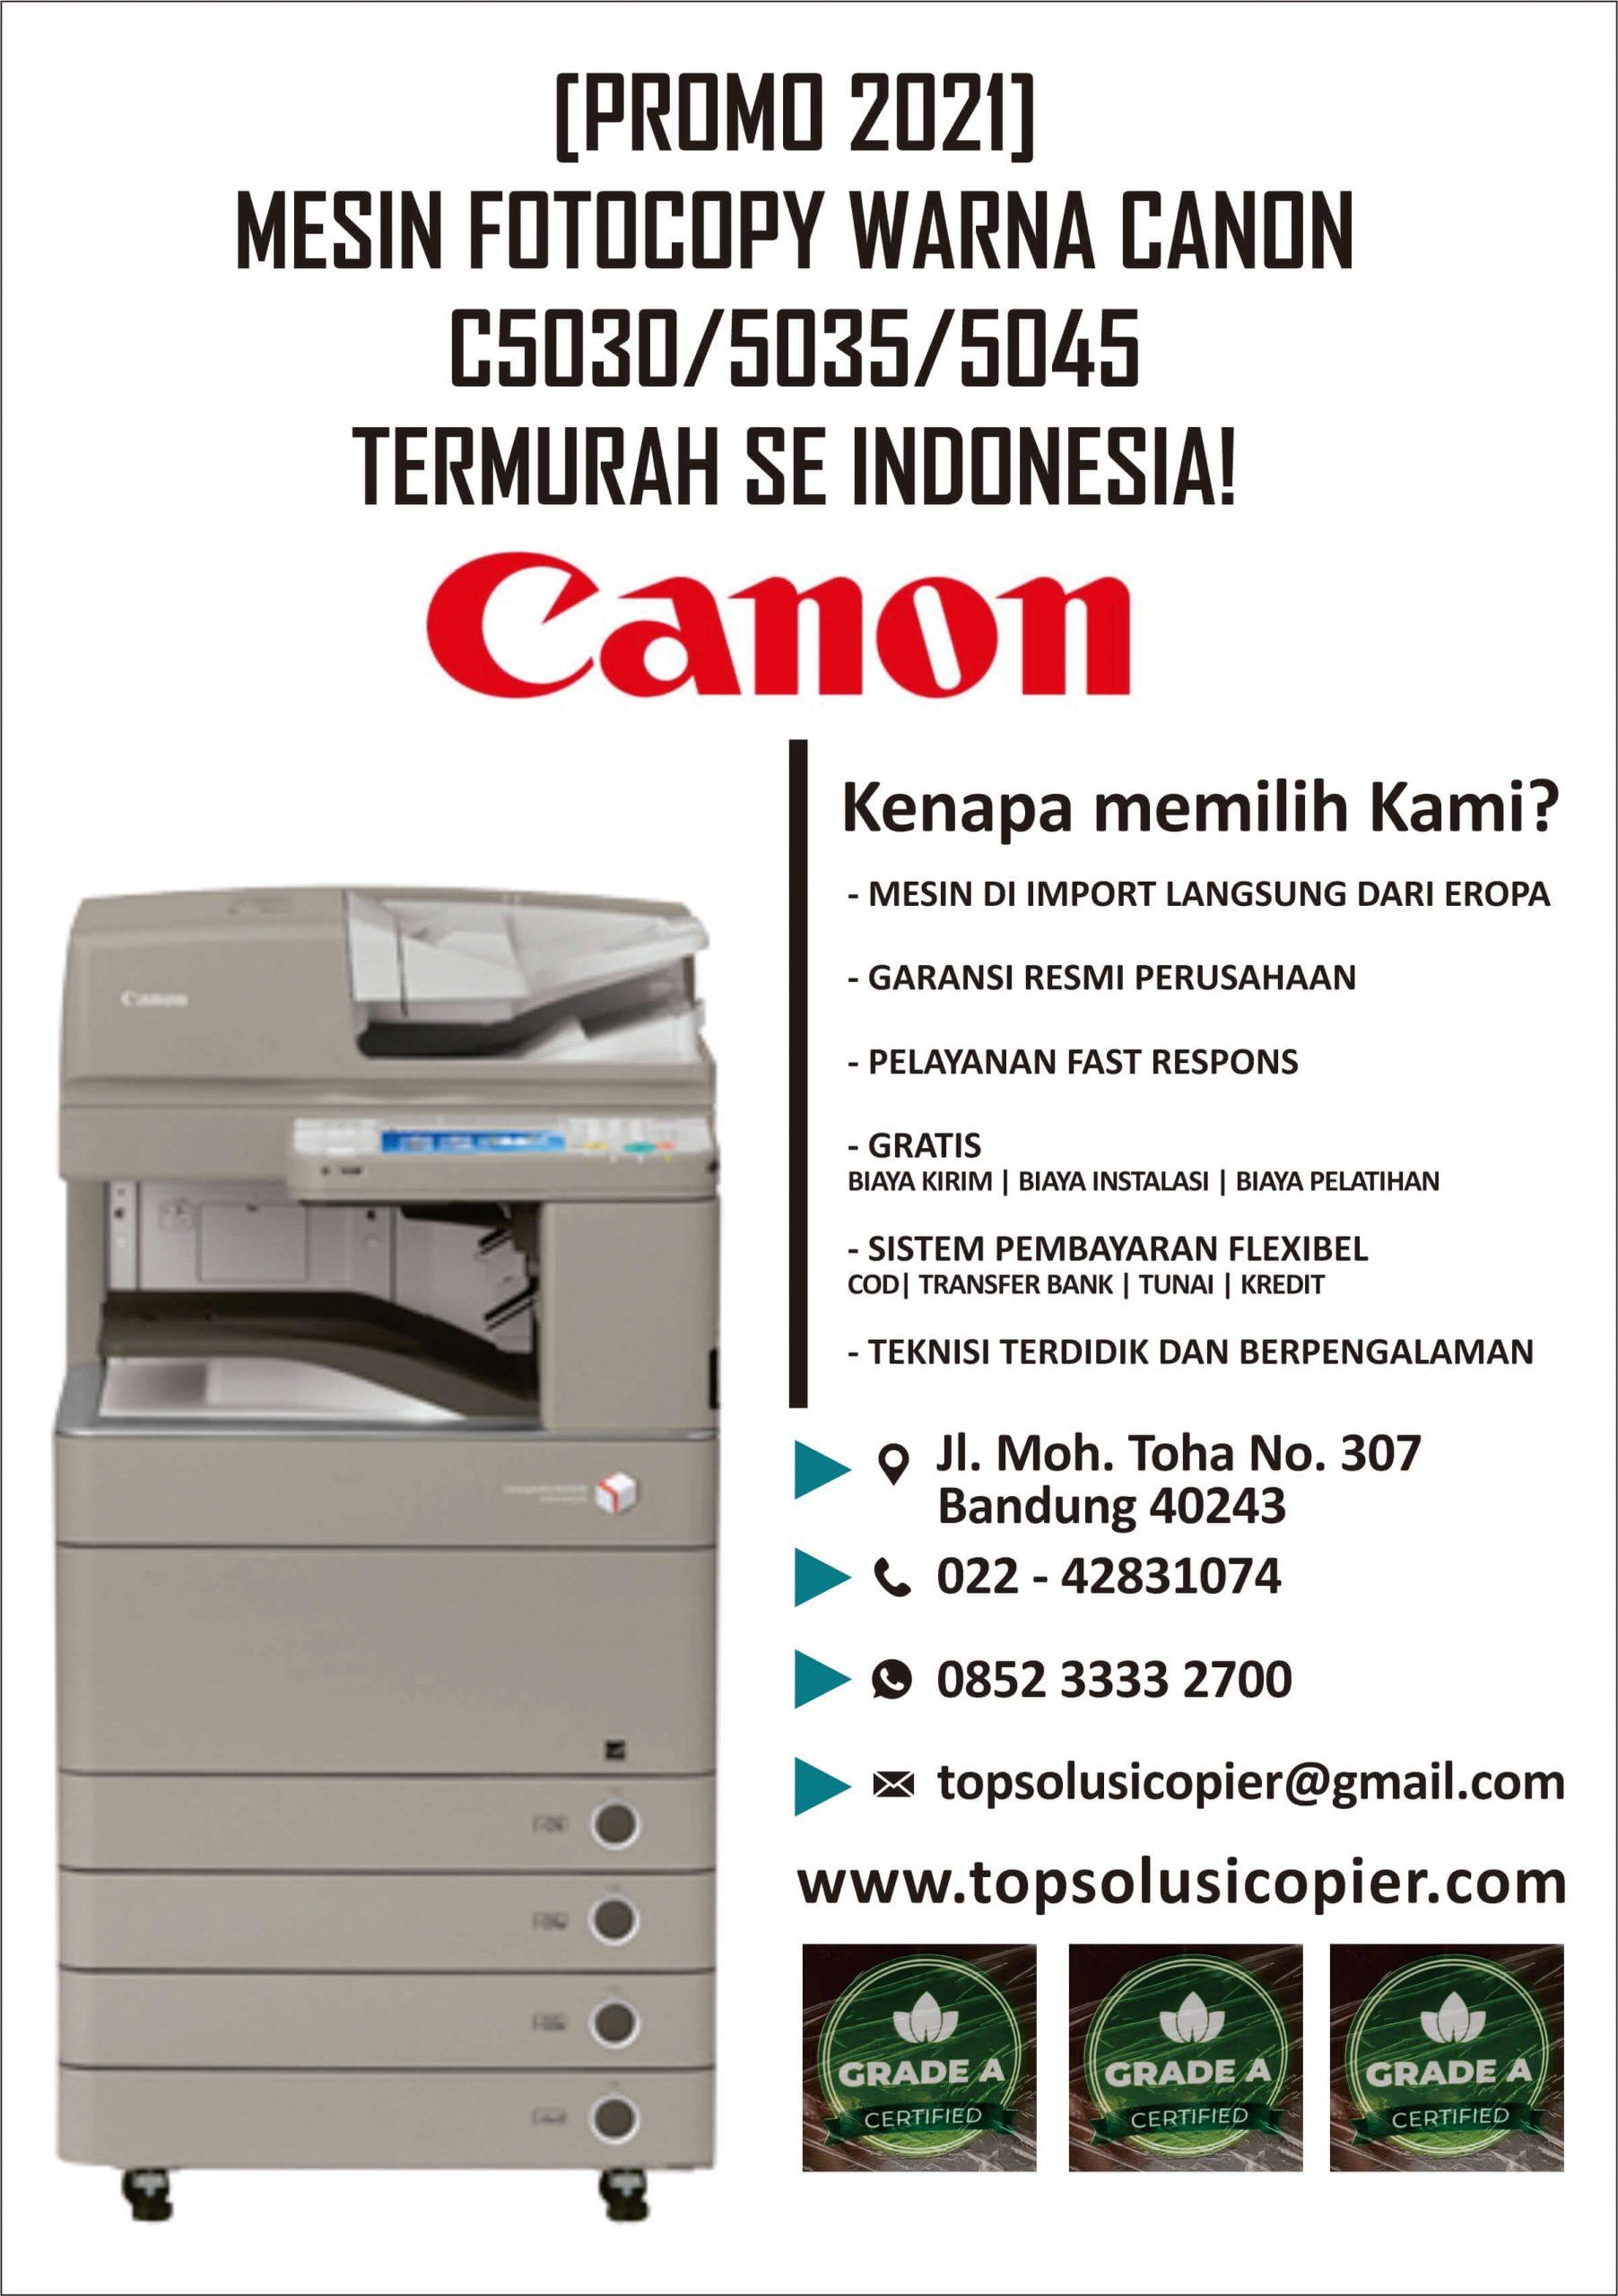 mesin fotocopy warna canon sumedang